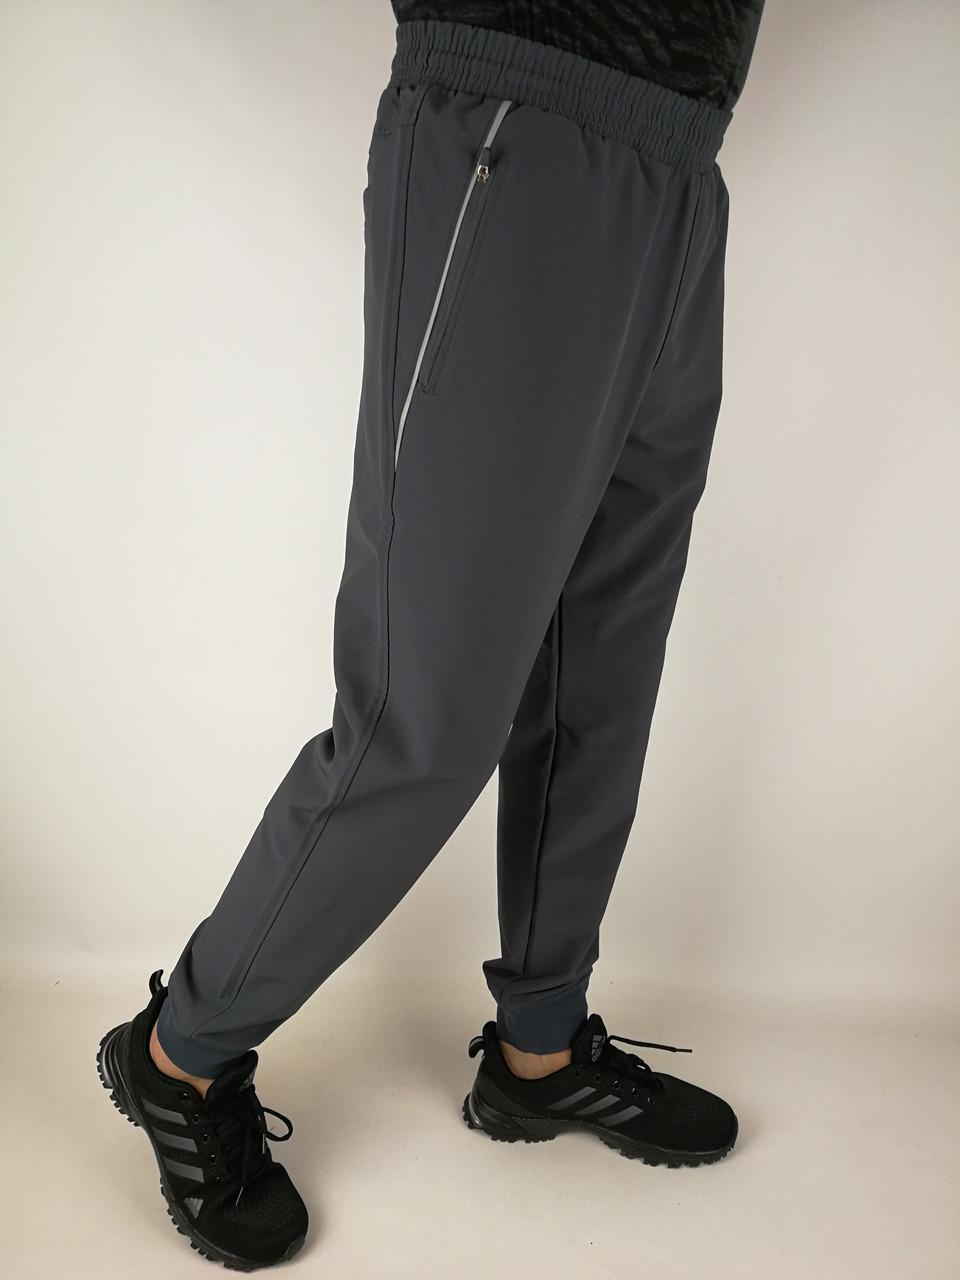 Мужские штаны виндстопер